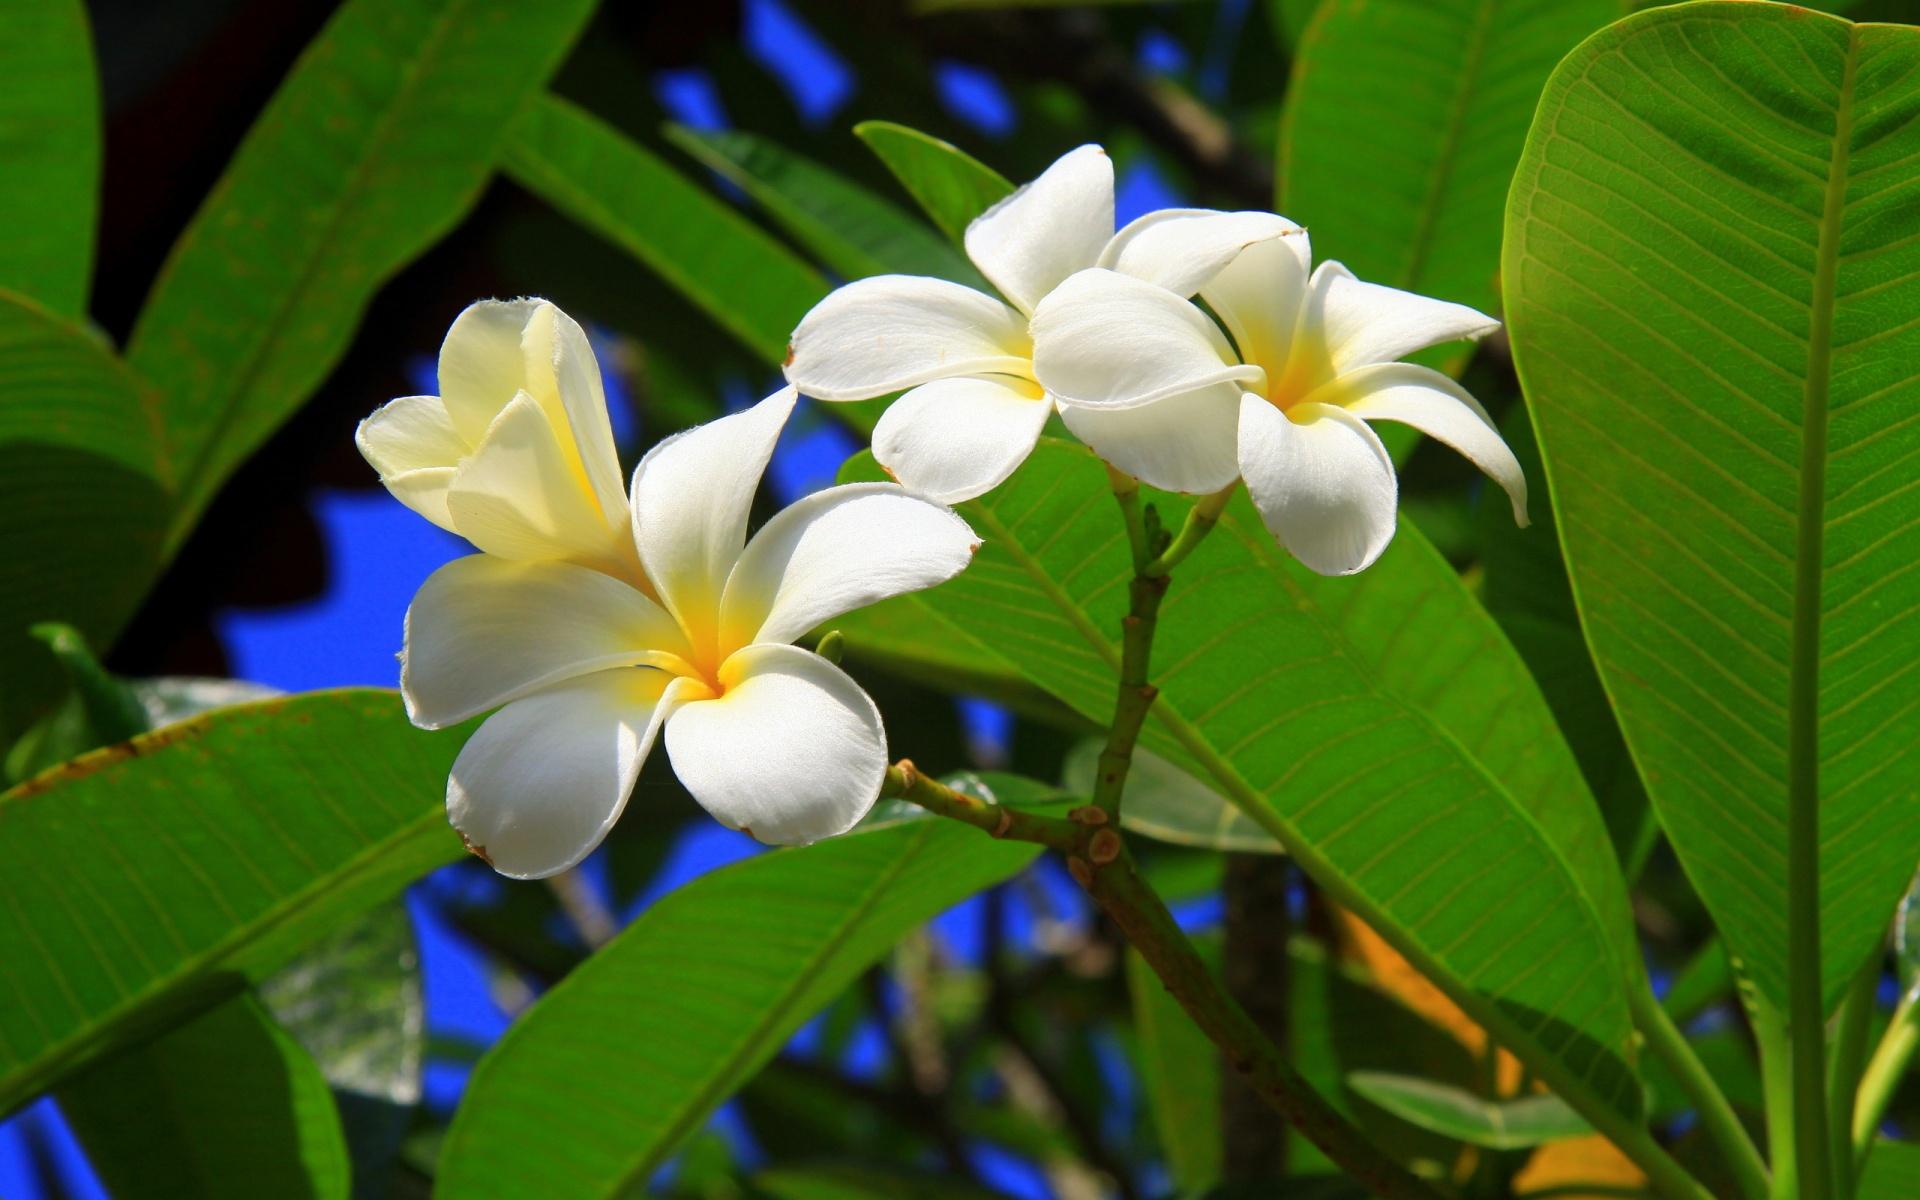 Free Tropical Flowers Wallpaper 21674 22214 Hd Wallpapersjpg